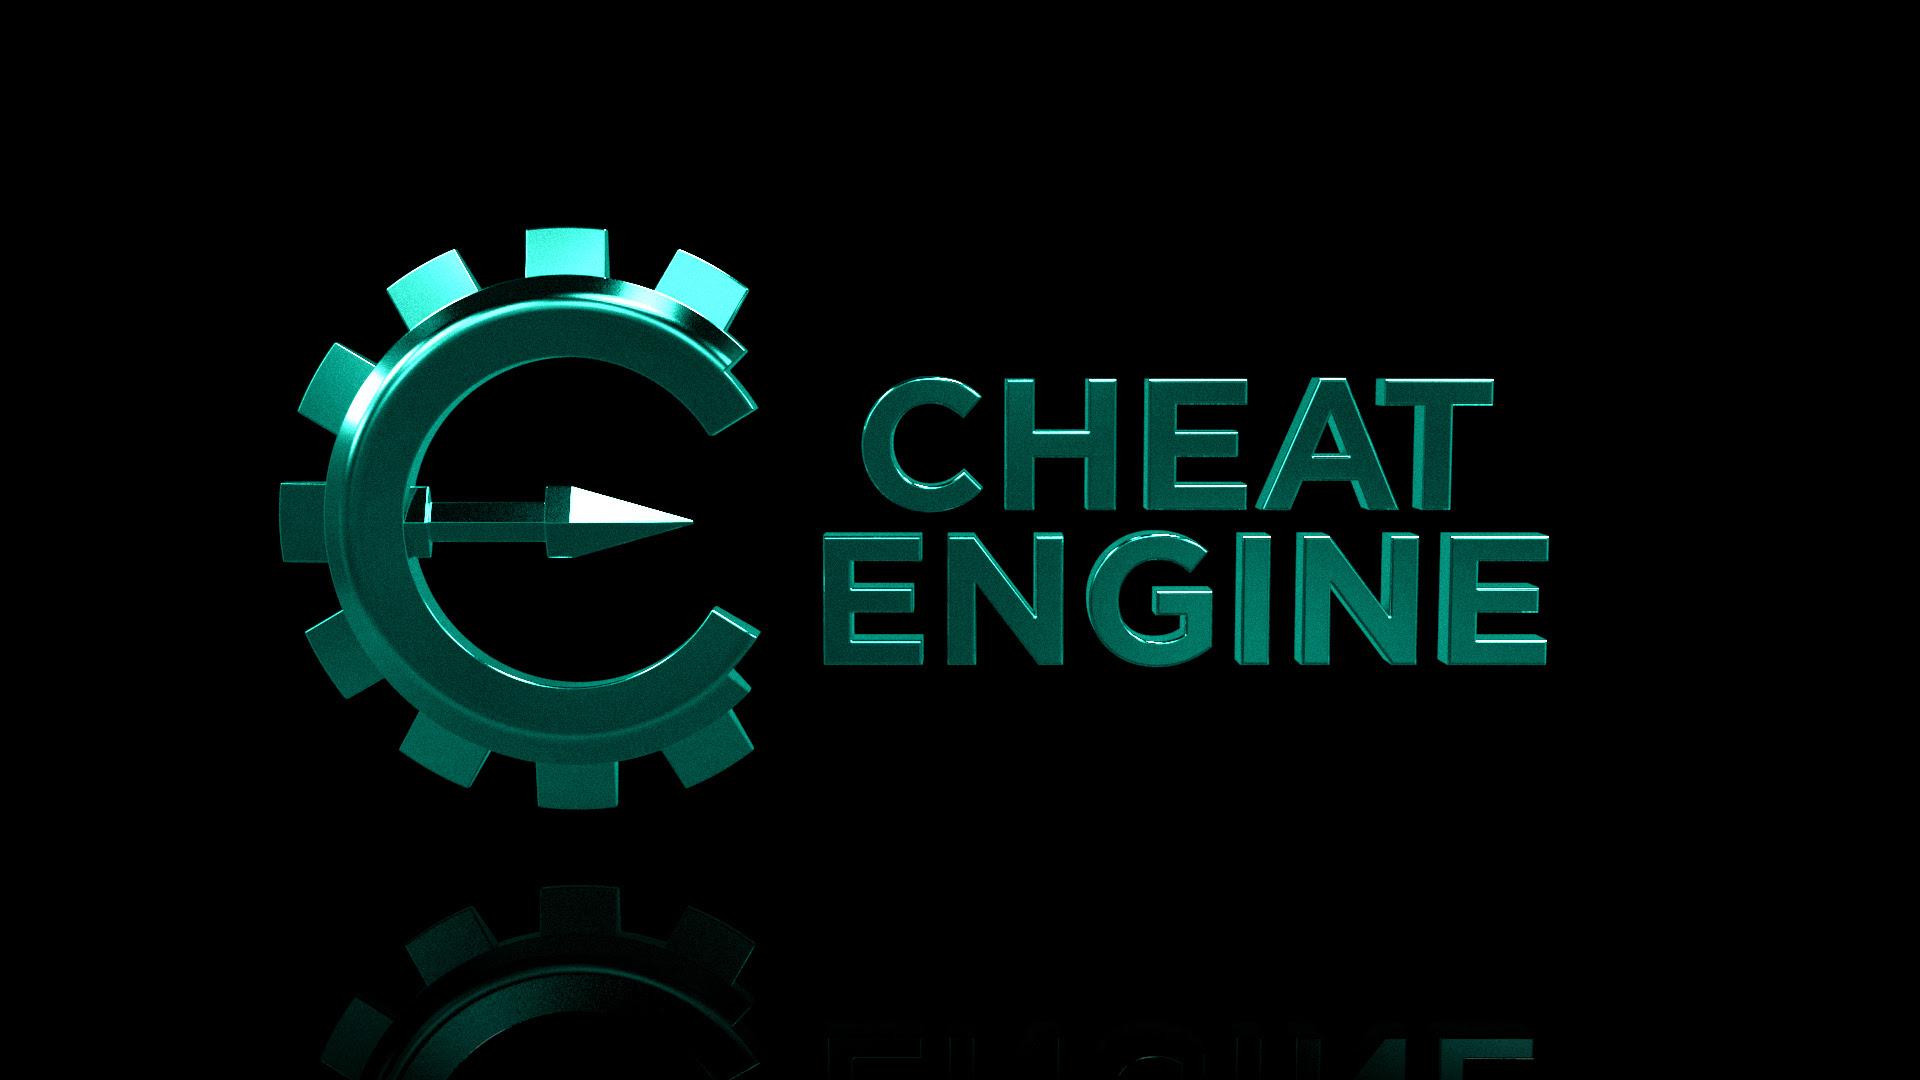 Download Cheat Engine Free